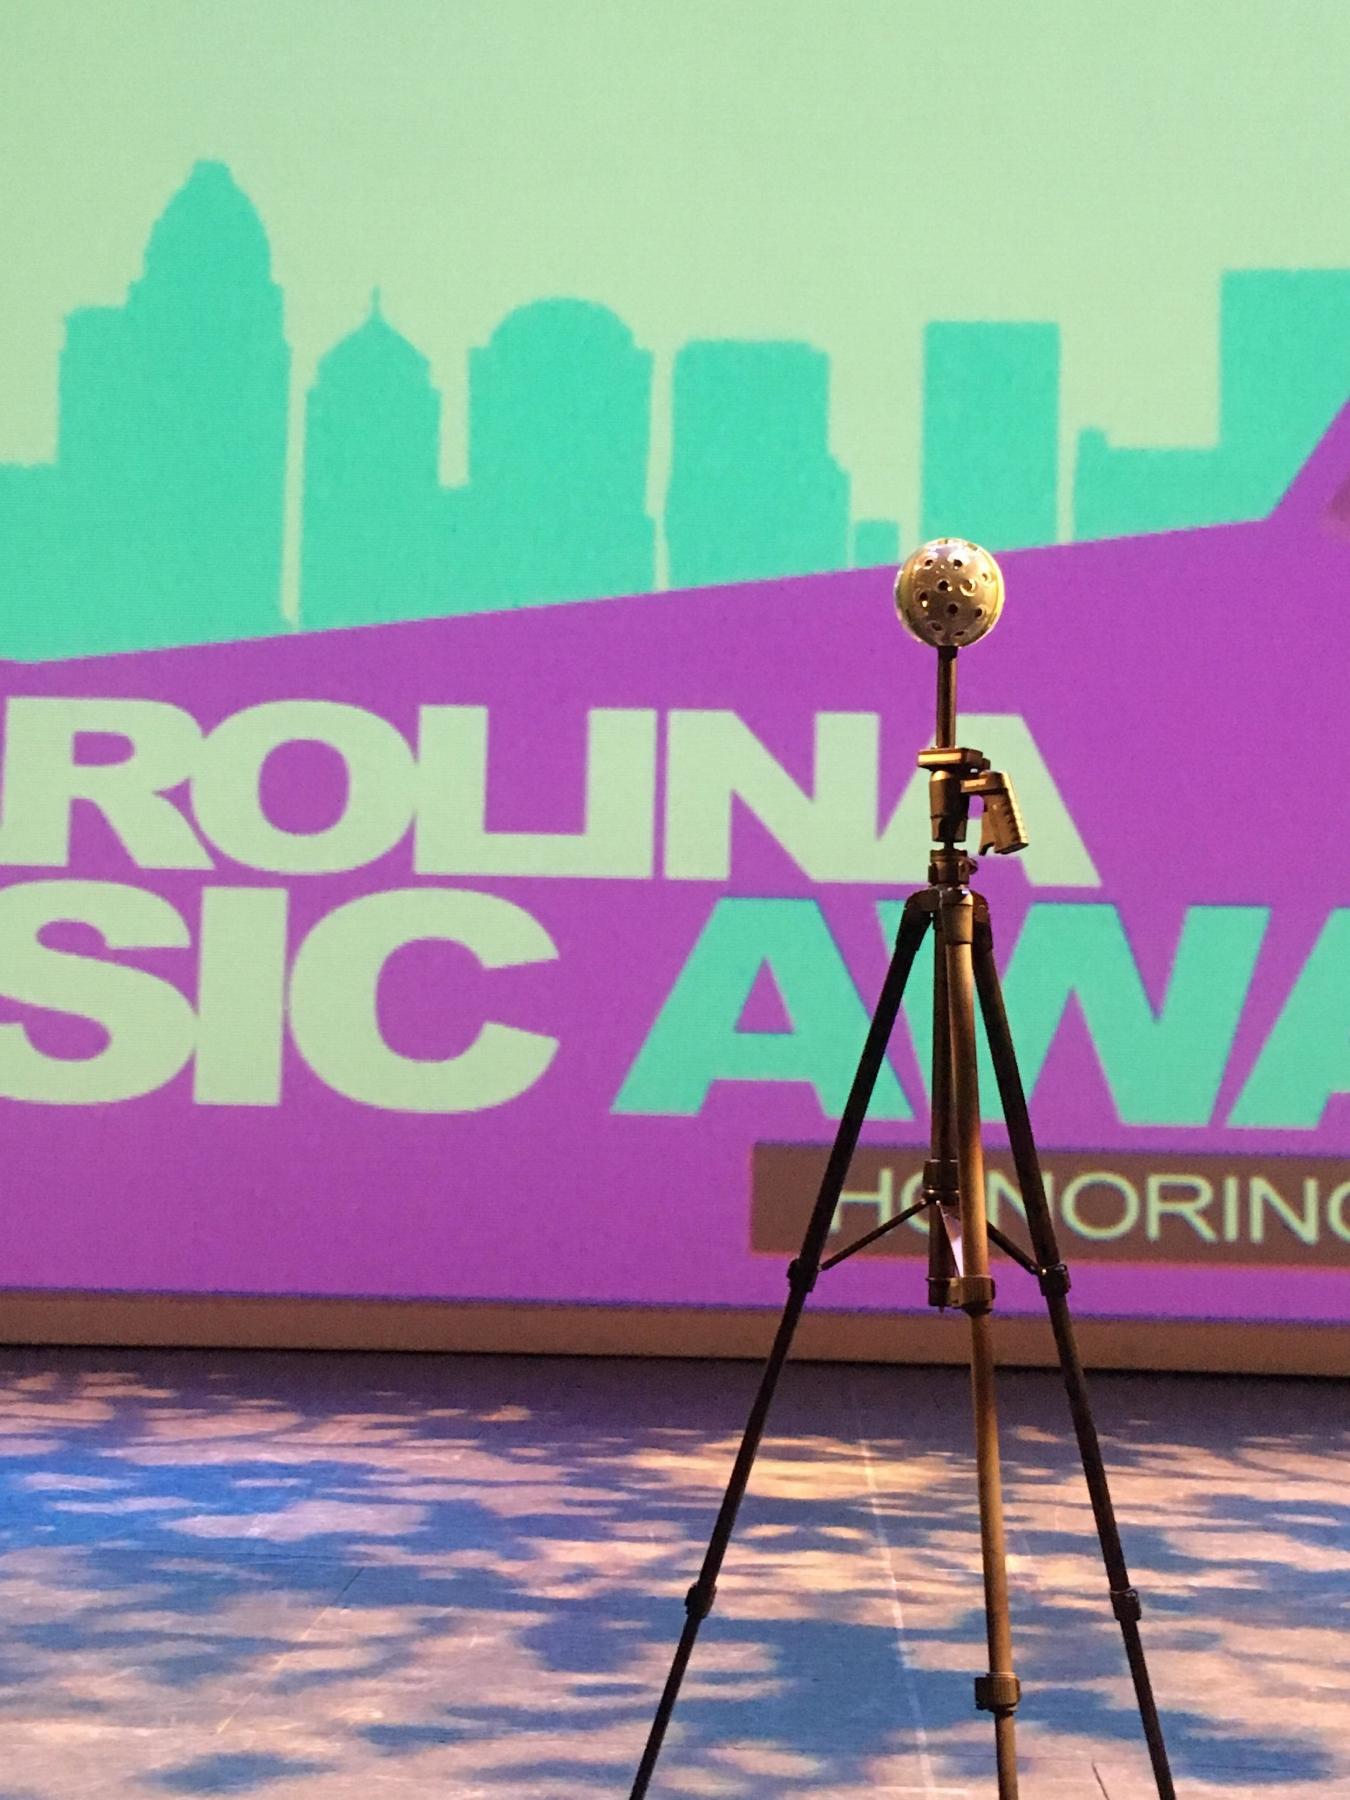 Our Panono 360° camera on stage at the Carolina Music Awards